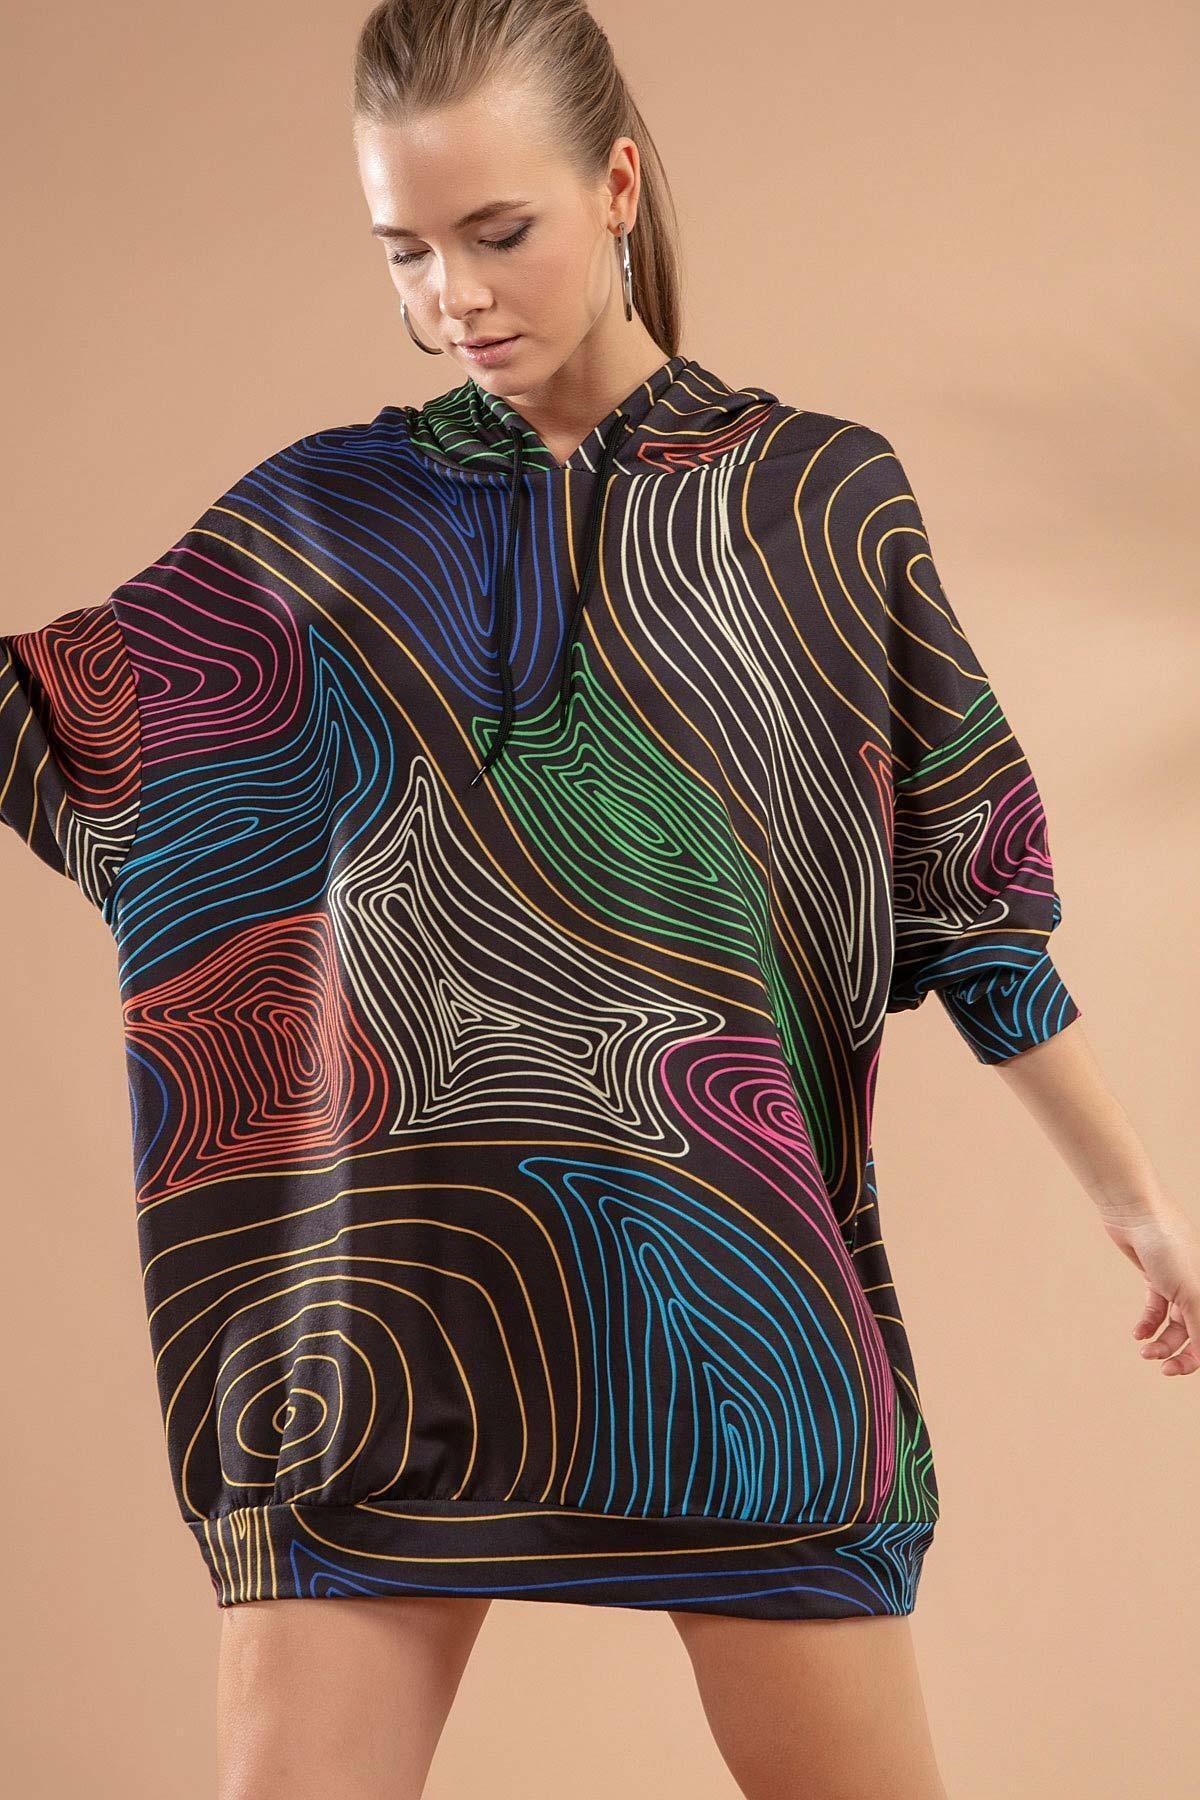 Pattaya Kadın Çizgili Kapşonlu Sweatshirt Elbise Y20w110-4125-18 1